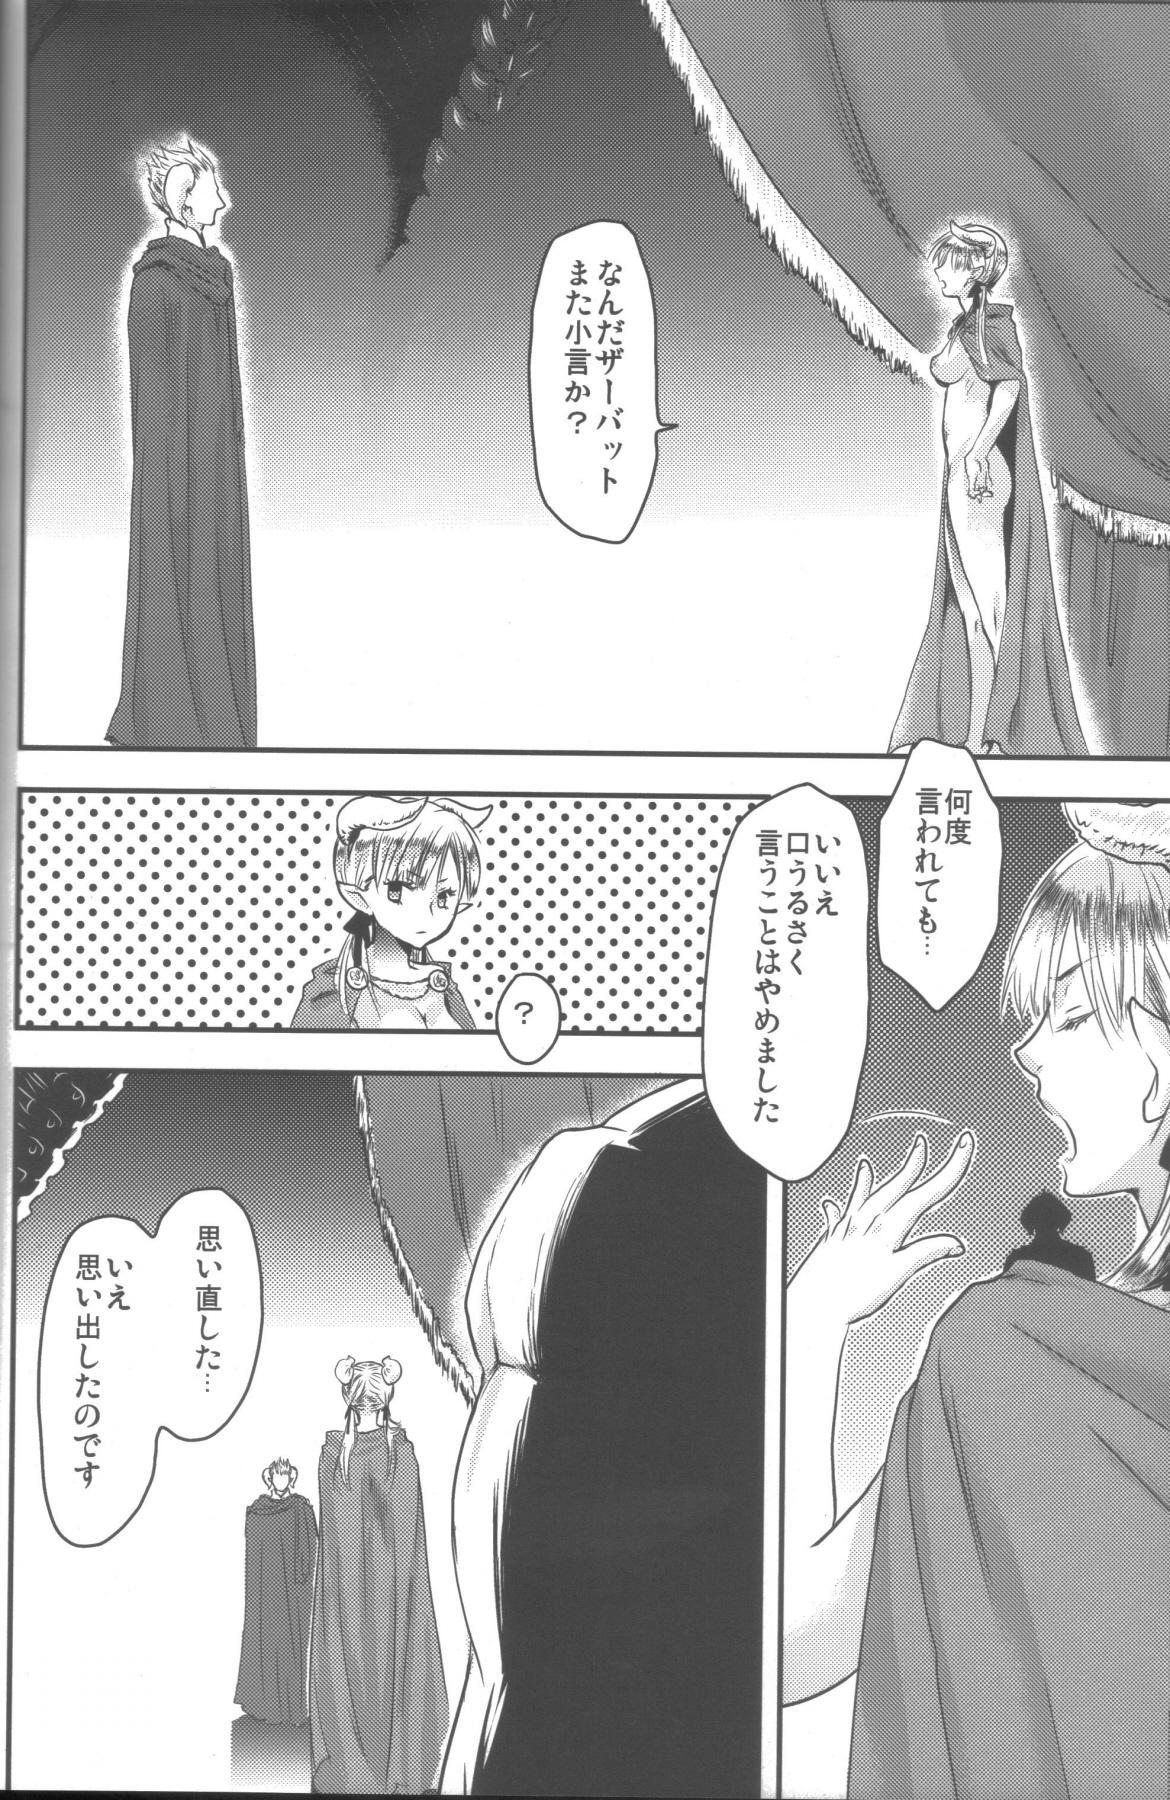 (C78) [Pish Lover (Amatake Akewo)] Hime Ouji-sama wa Harami-goro 8